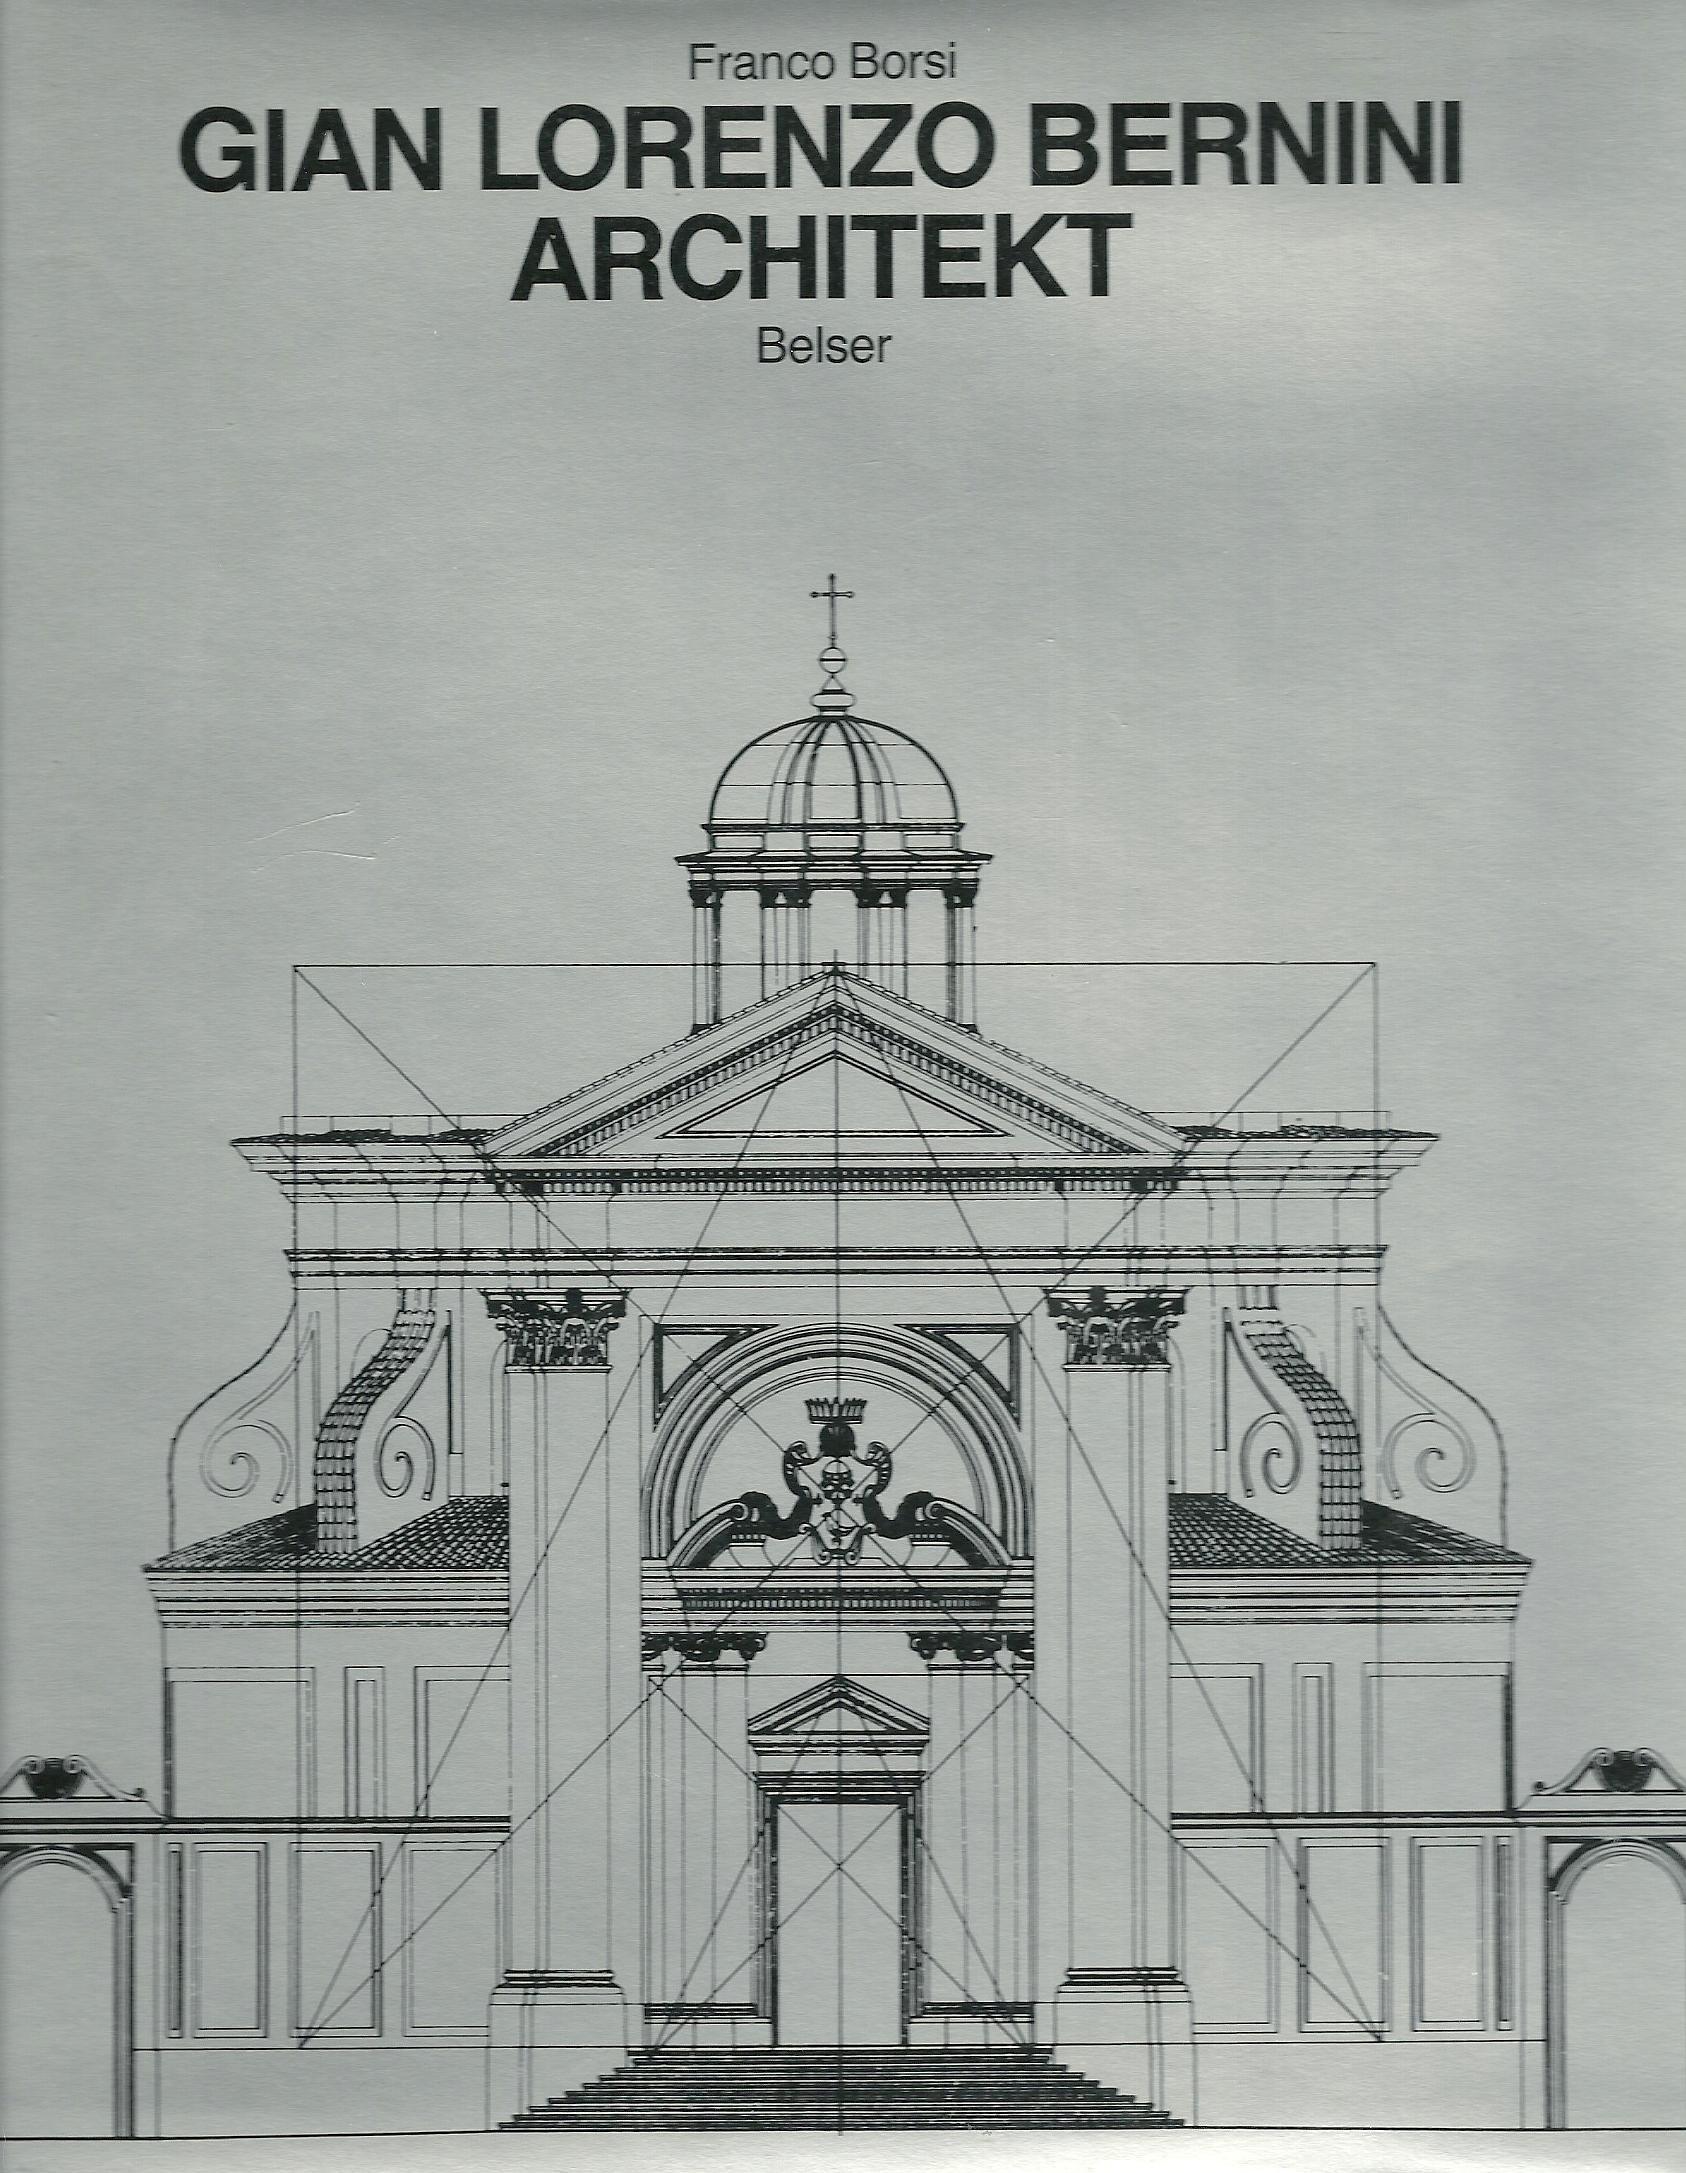 Gesamtwerk Architektur gian lorenzo bernini architekt das gesamtwerk amazon de franco